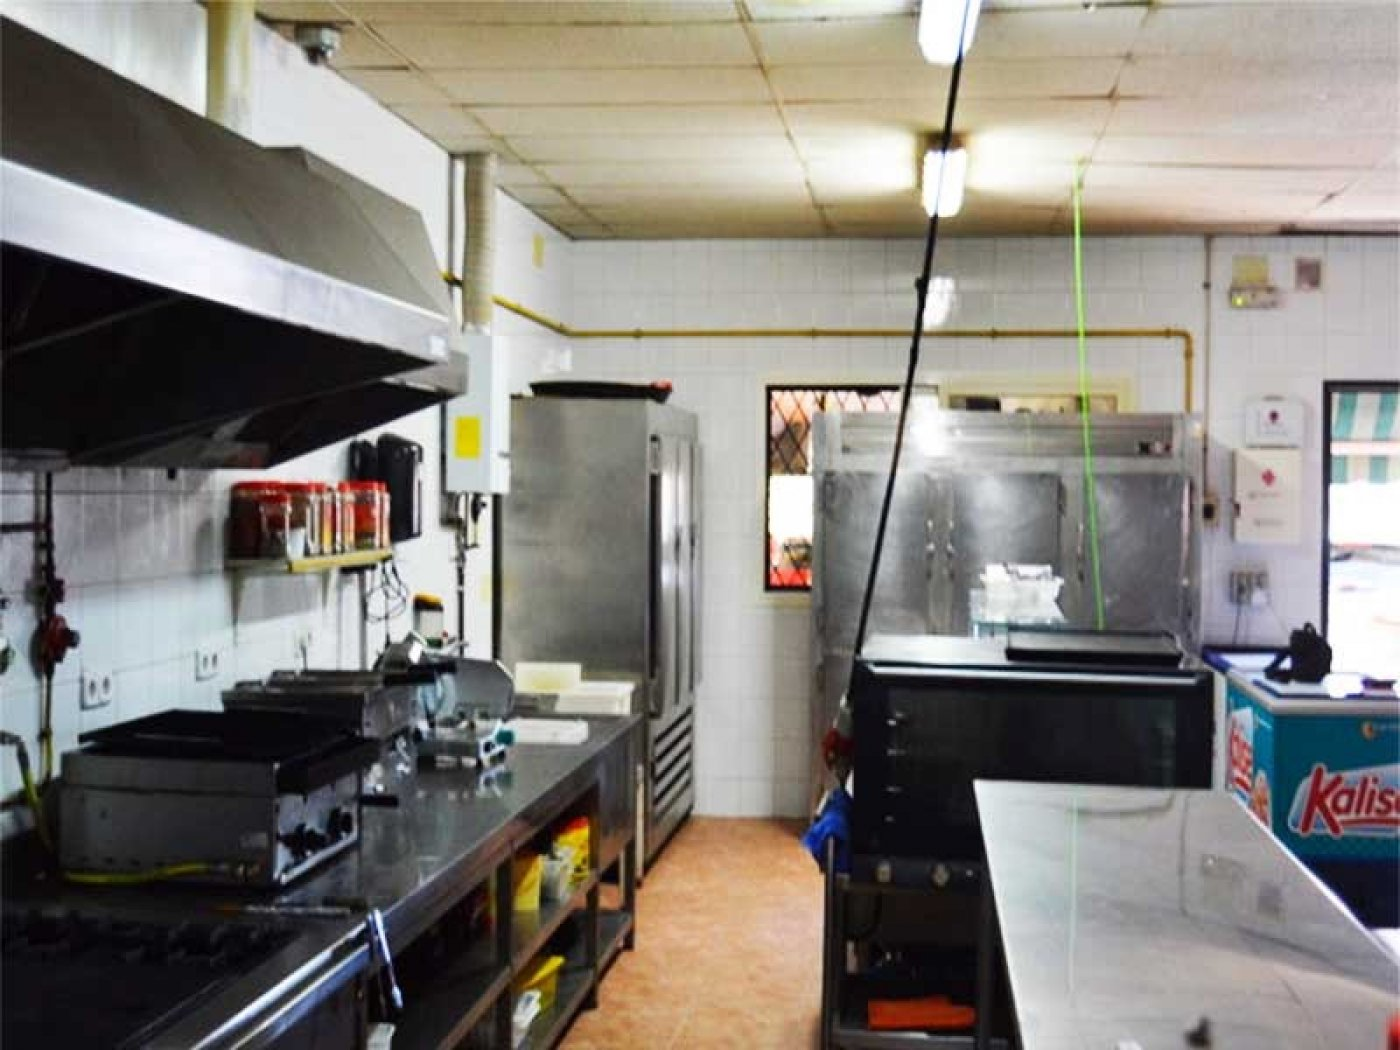 Nave restaurante en polígono cerca de sant sadurní d´anoia - imagenInmueble35